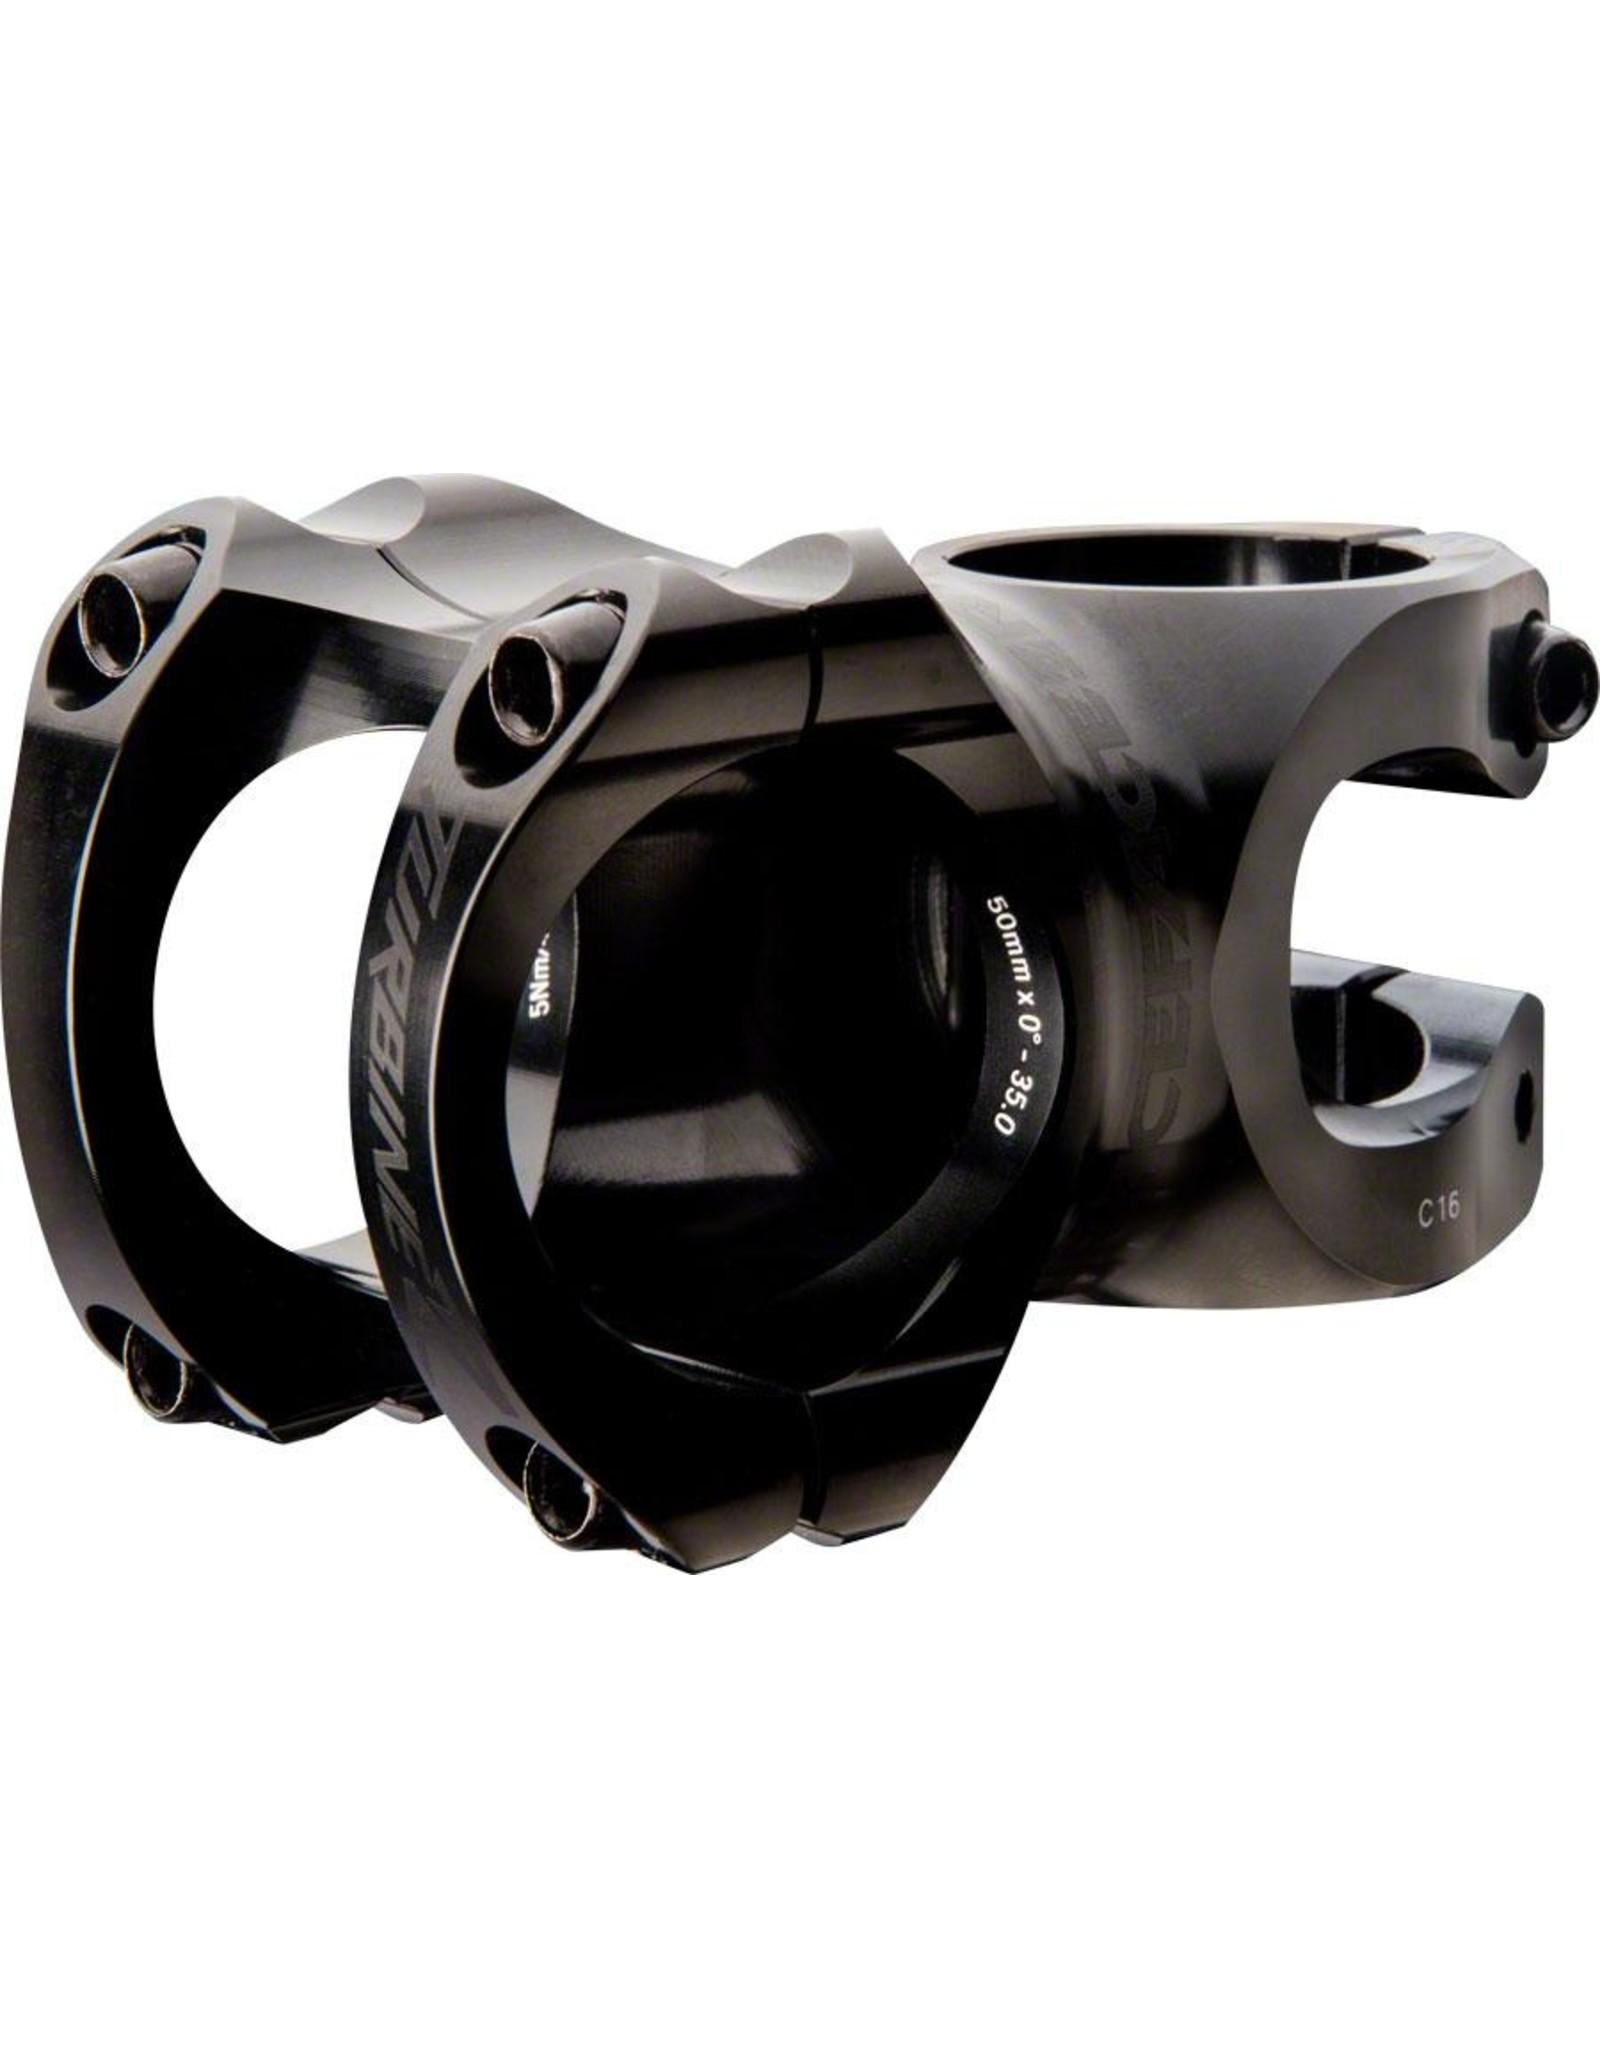 Race Face ST17TURR3540X0BLK: Race Face Turbine Stem, 35mm x 40mm, Black